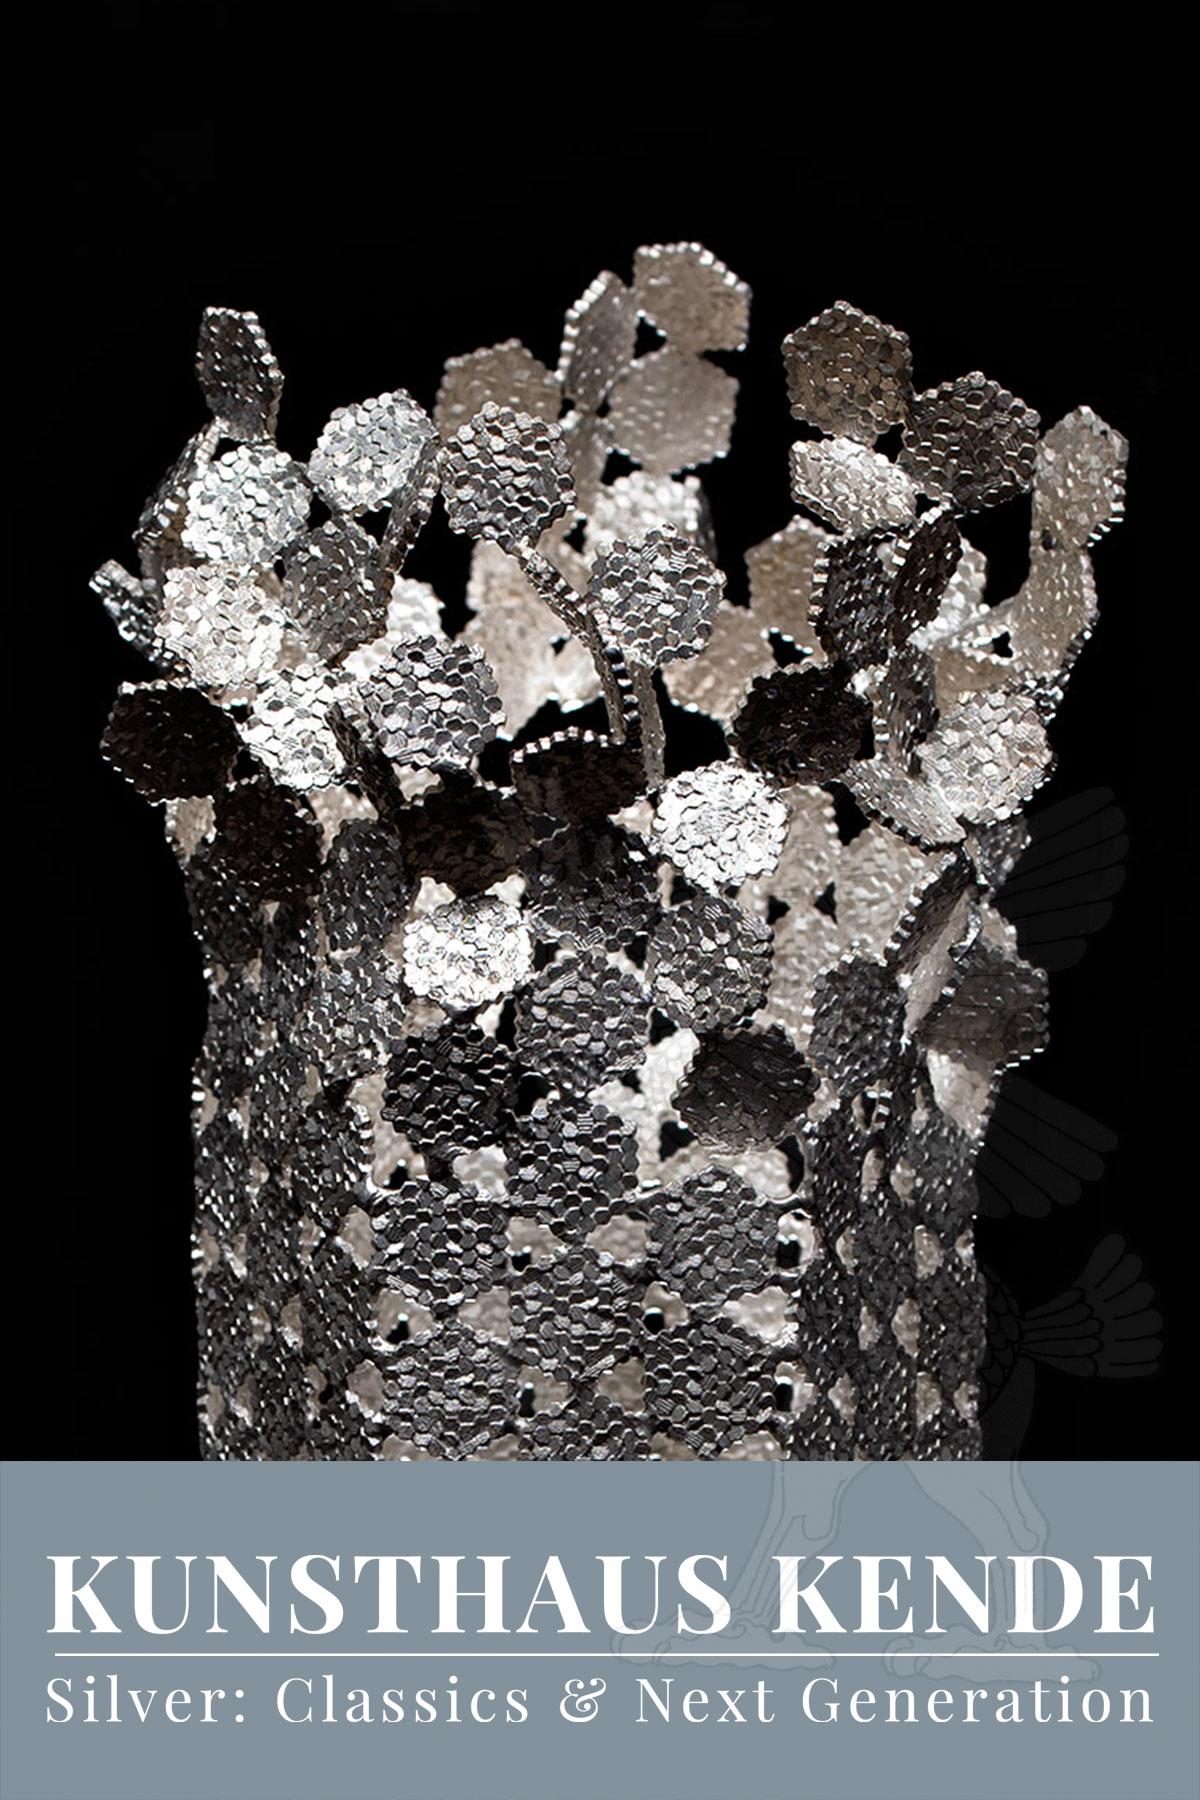 Moderne Sterling Silber Vase London Silberankauf Stuttgart besteck tafelsilber